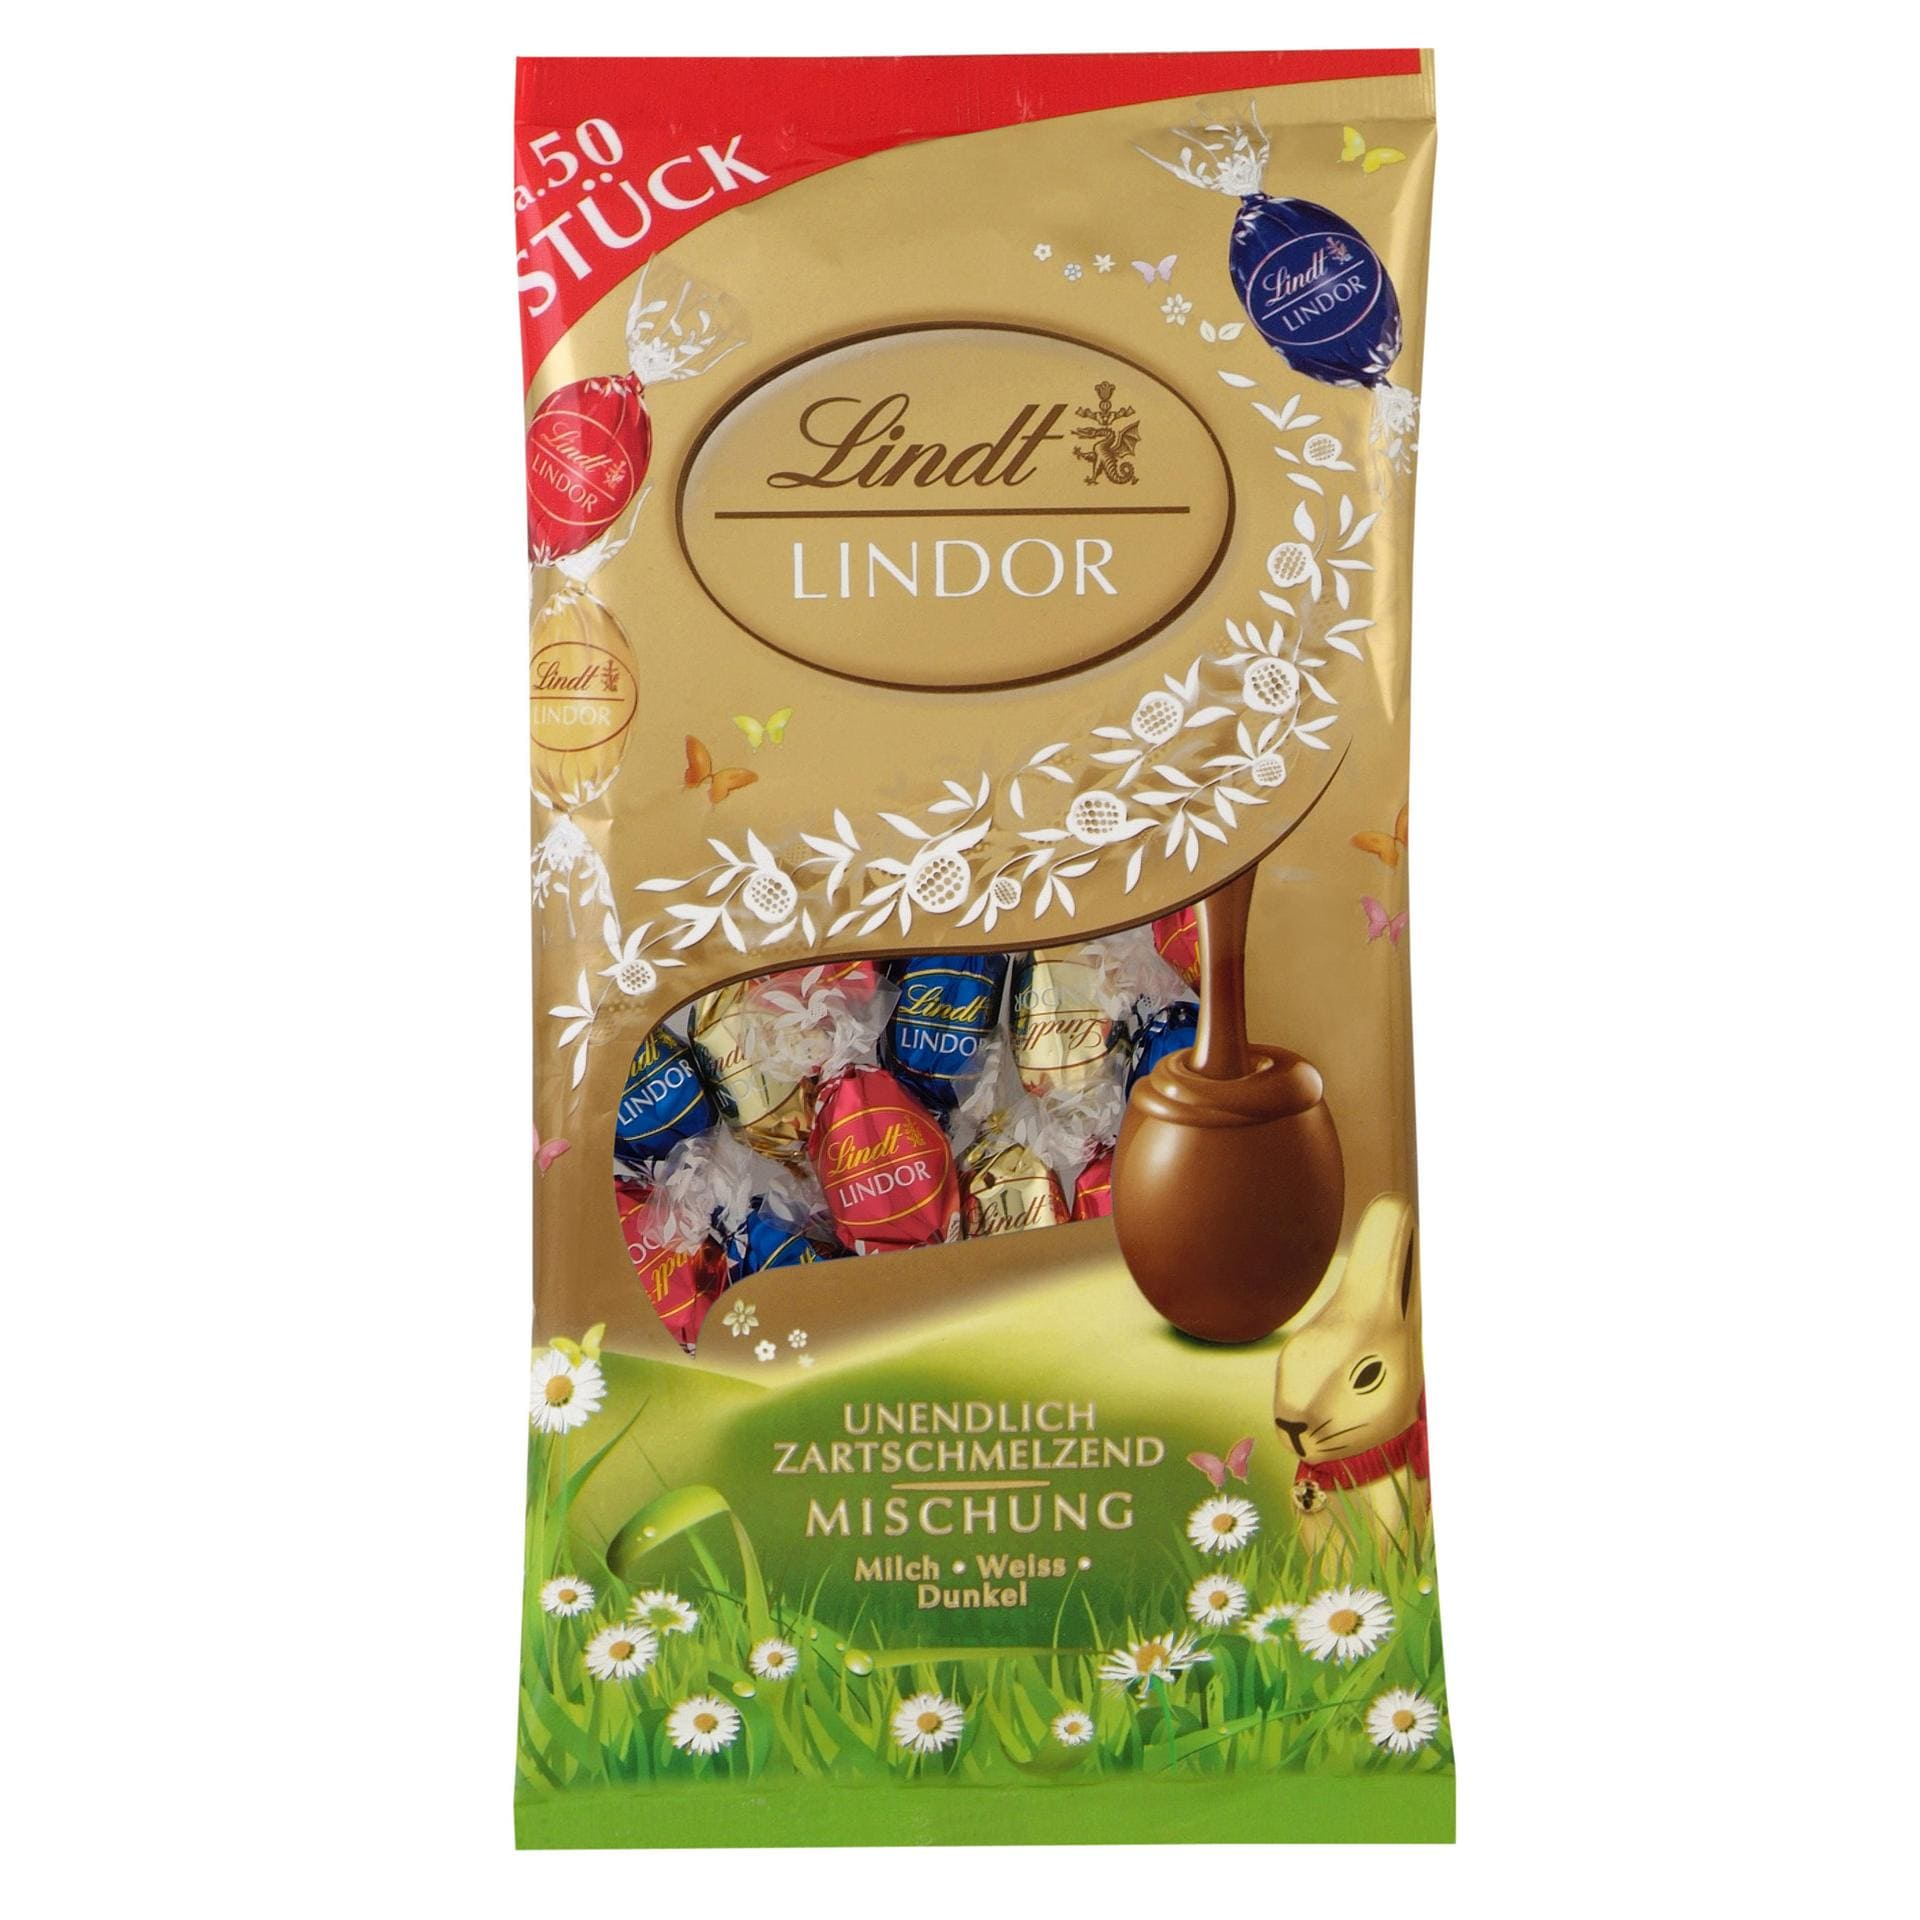 Lindt Lindor Mini-Eier Mischung 236g